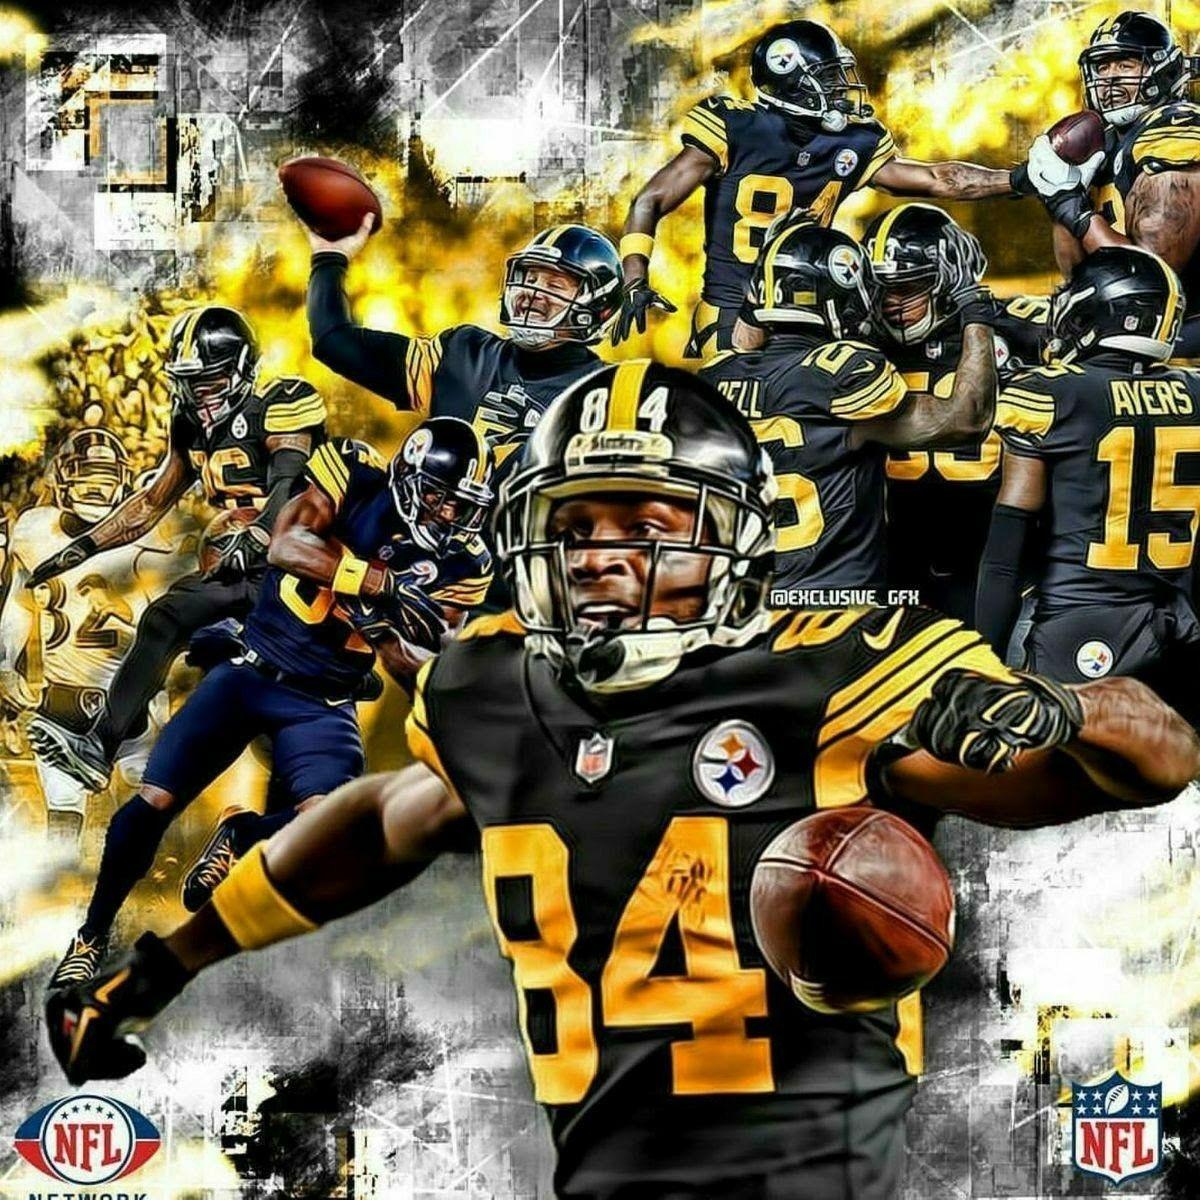 steelergalfan4life - All Dem Boyz Rule Pittsburgh Steelers Players 2cc833044